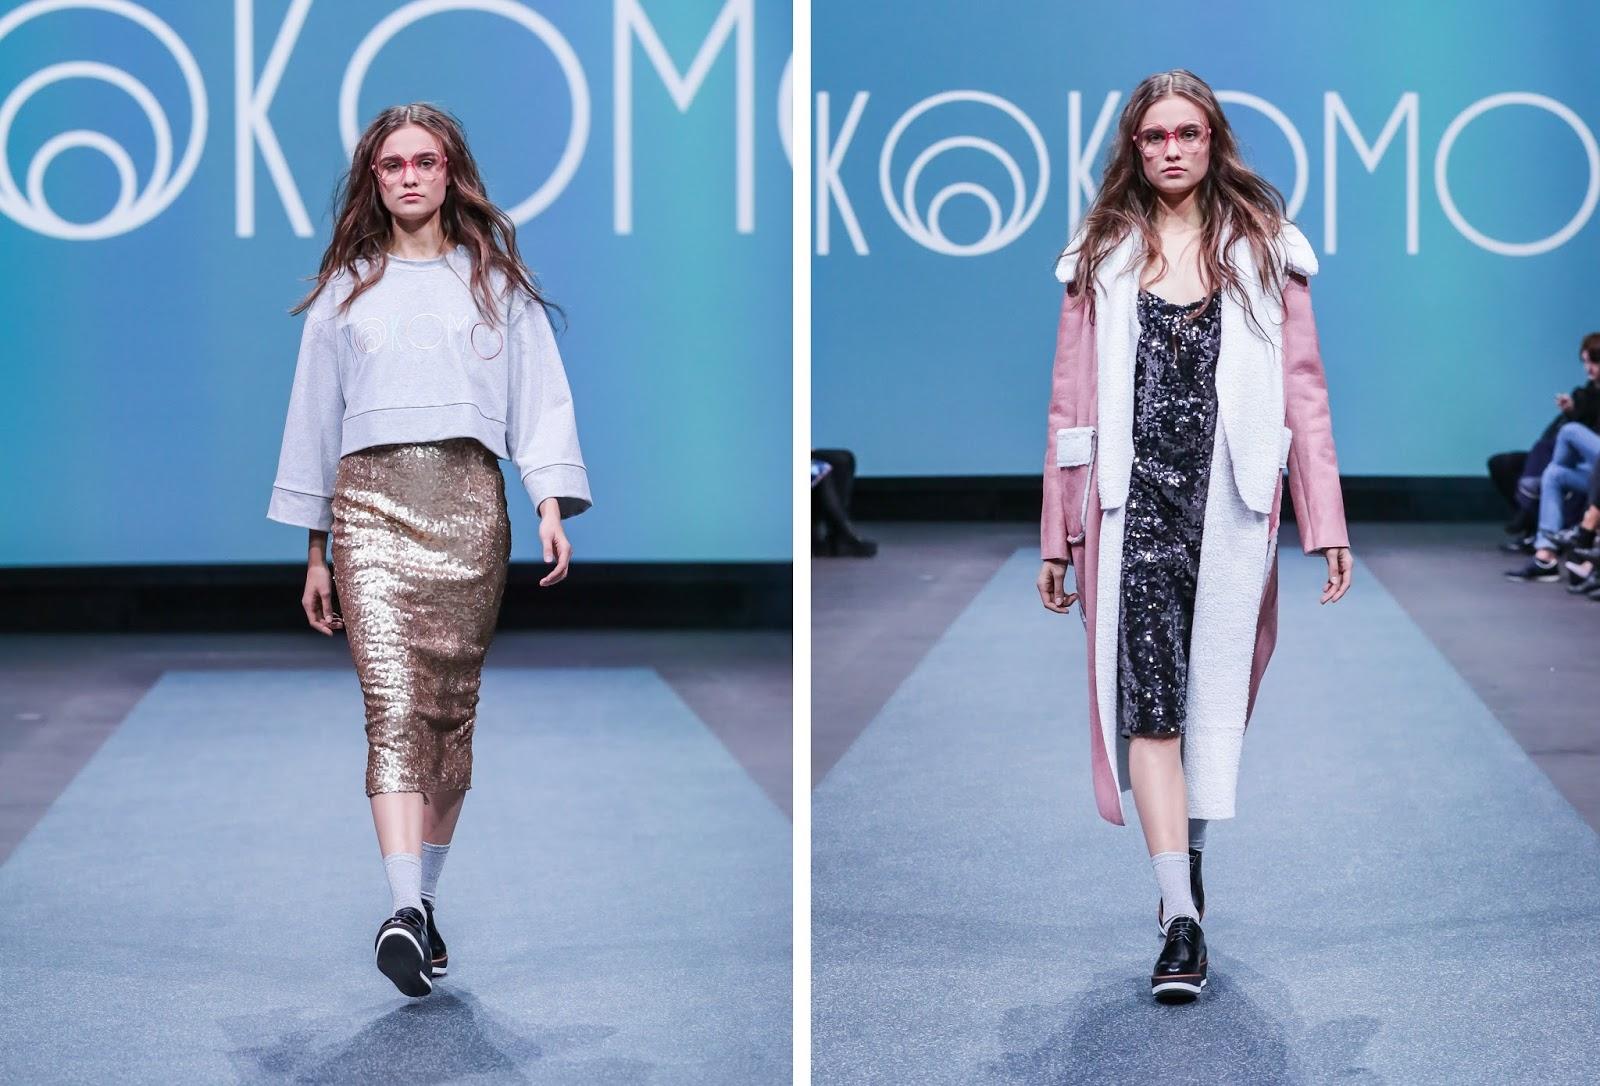 tallinn fashion week kokomo collection